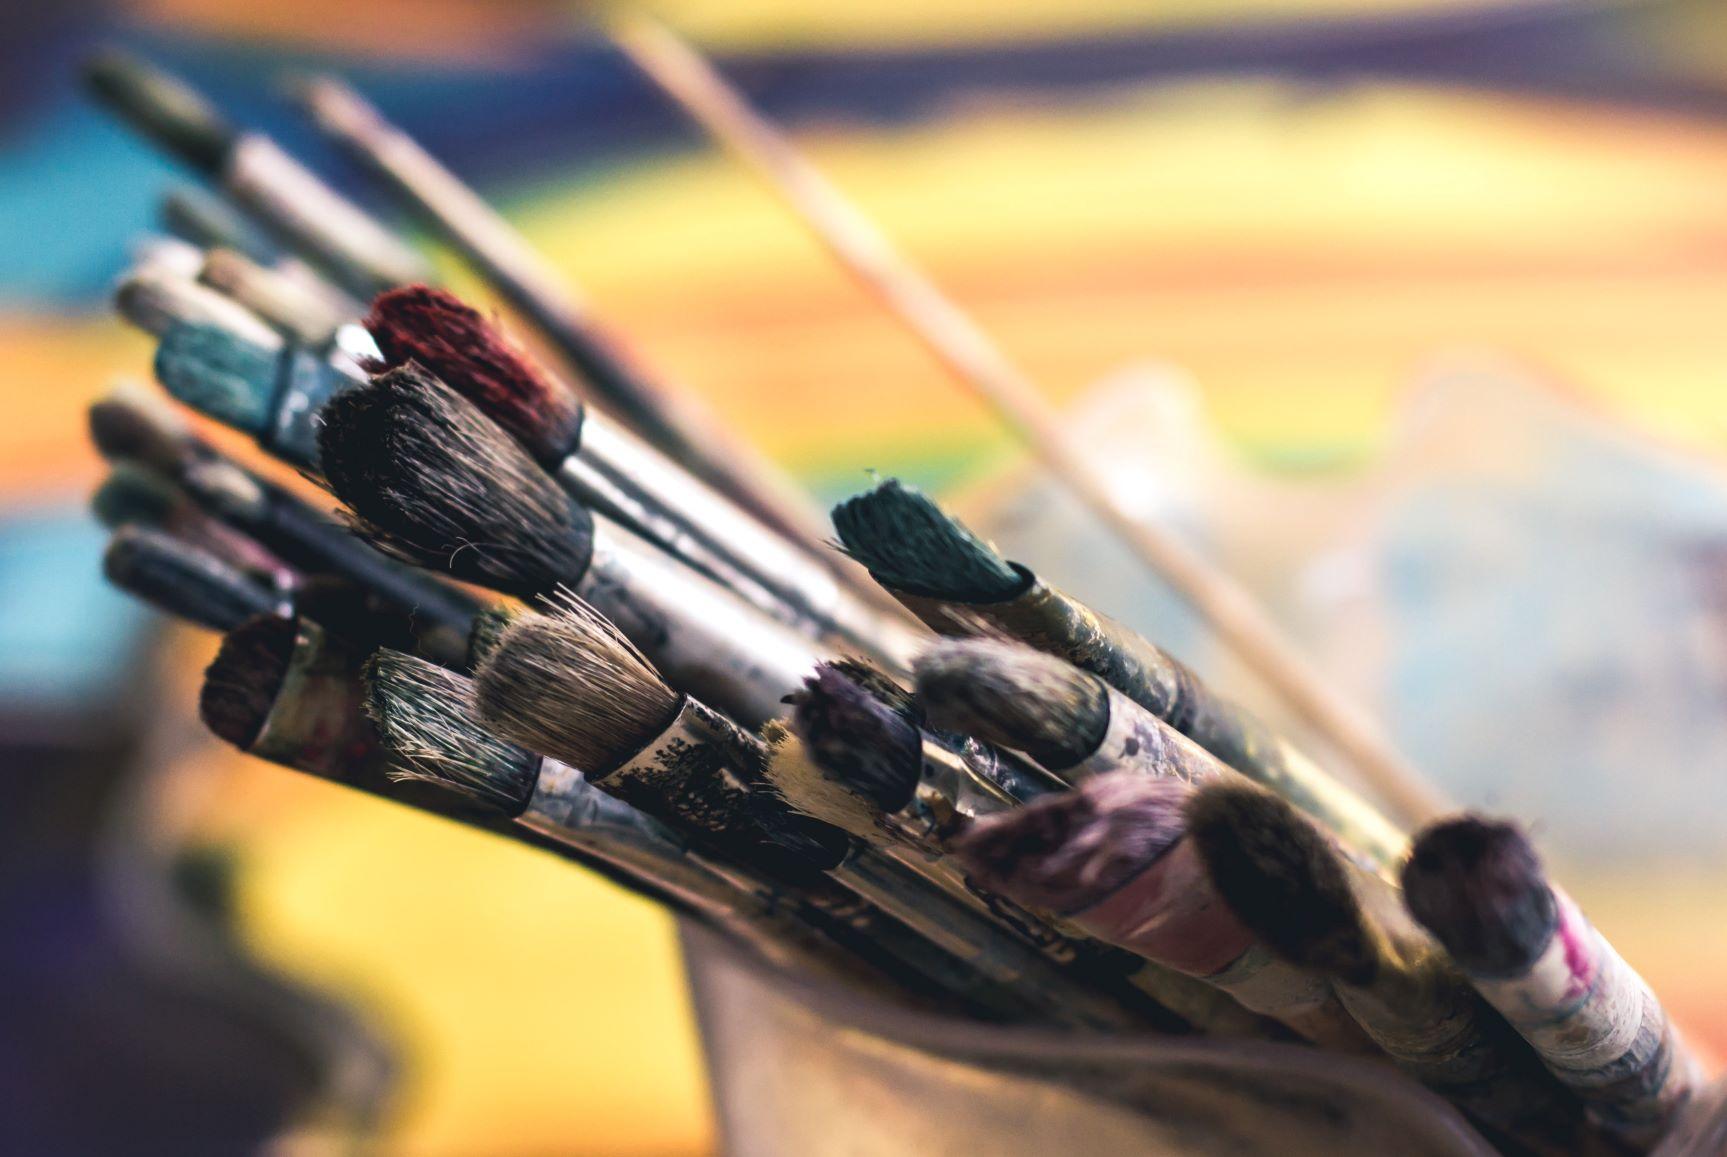 art-creative-paintbrush-1057553.jpg